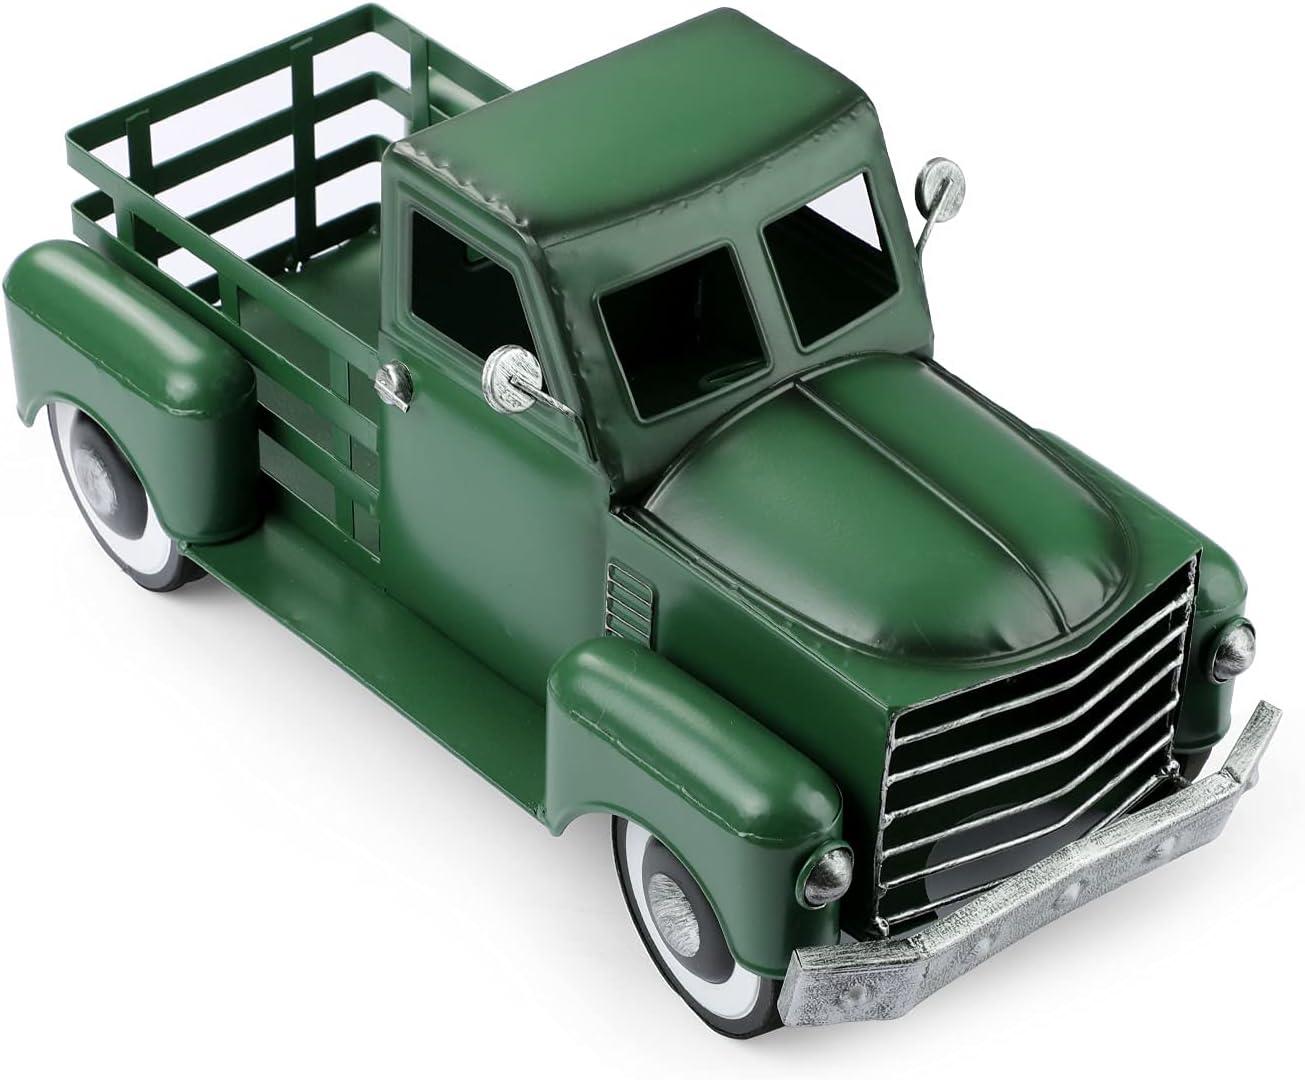 Pylemon Vintage Green Truck Décor, Farmhouse Green Truck Christmas Decoration, Decorative Tabletop Storage & Pick-up Metal Truck Planter (Large Size)